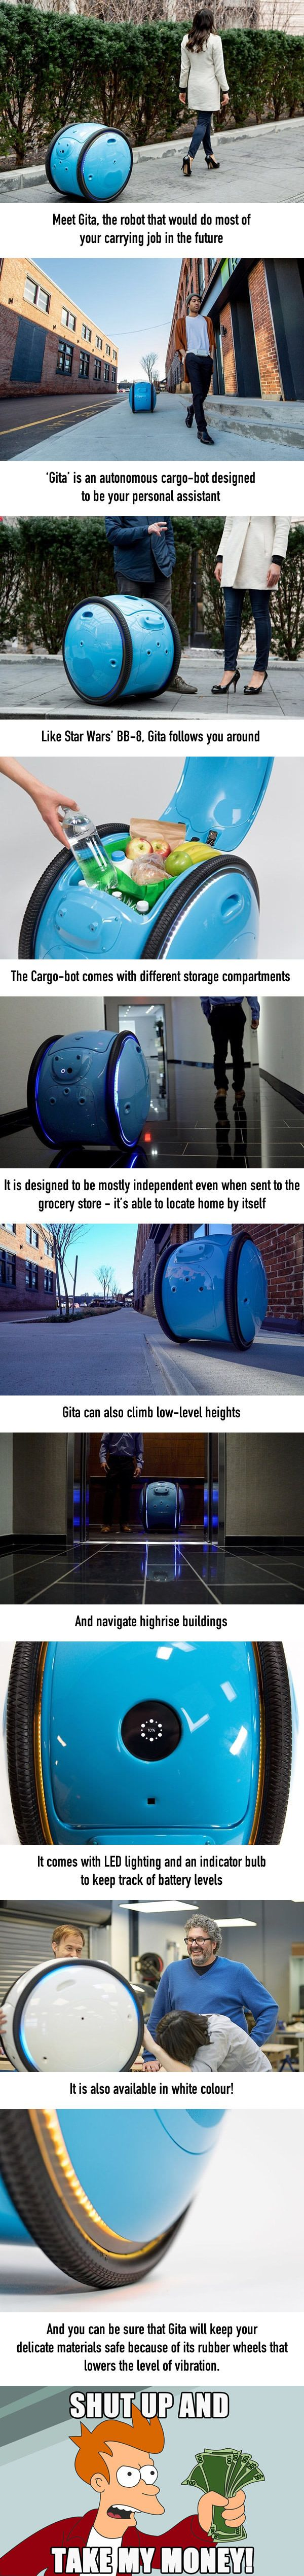 Gita Is an Autonomous Cargo Robot That Will Follow You Around - 9GAG #funnypics #funny #lol